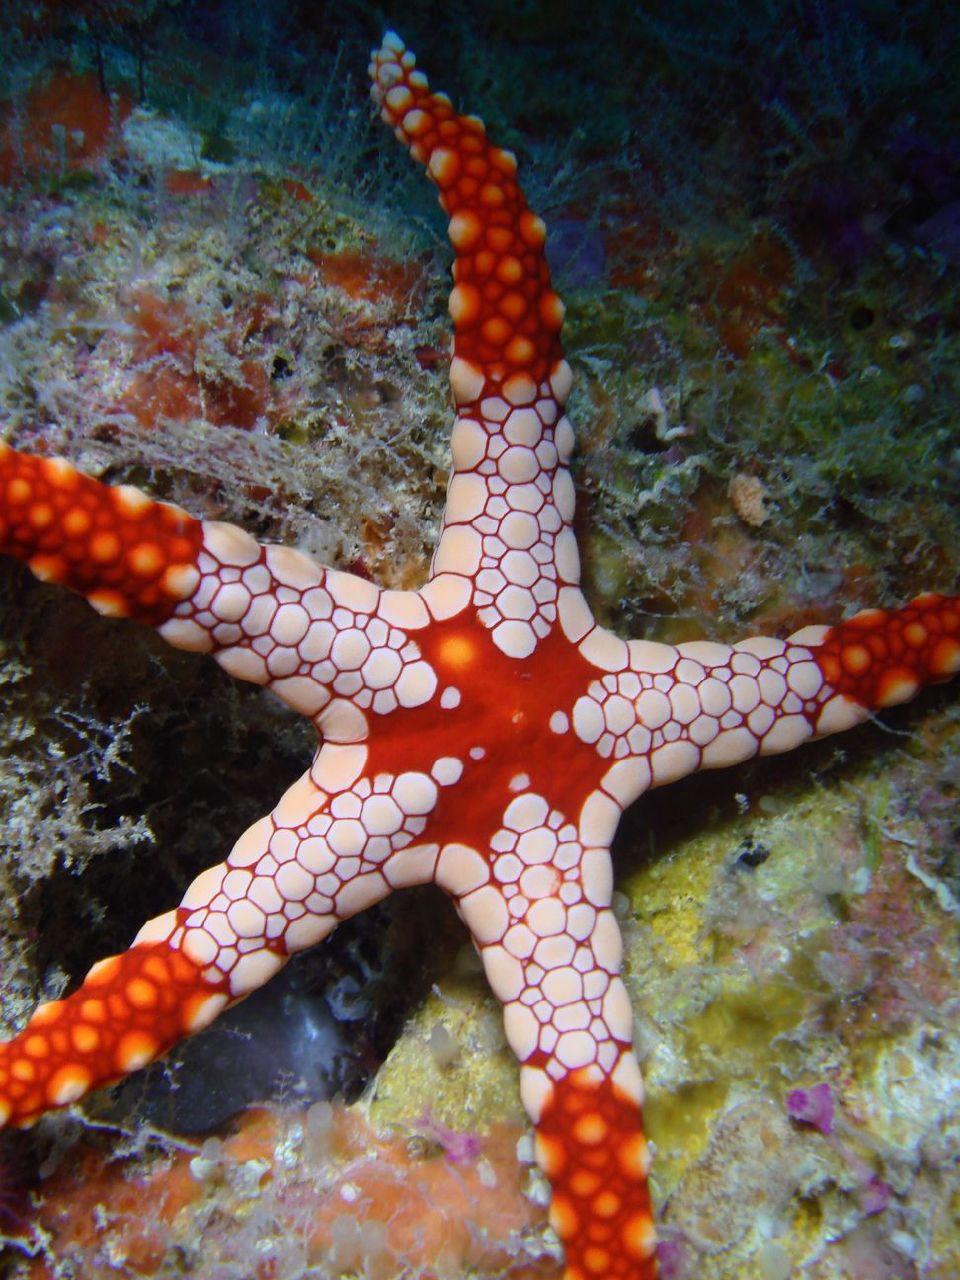 Photo plongee 3 decembre 2007 Poindimie #13